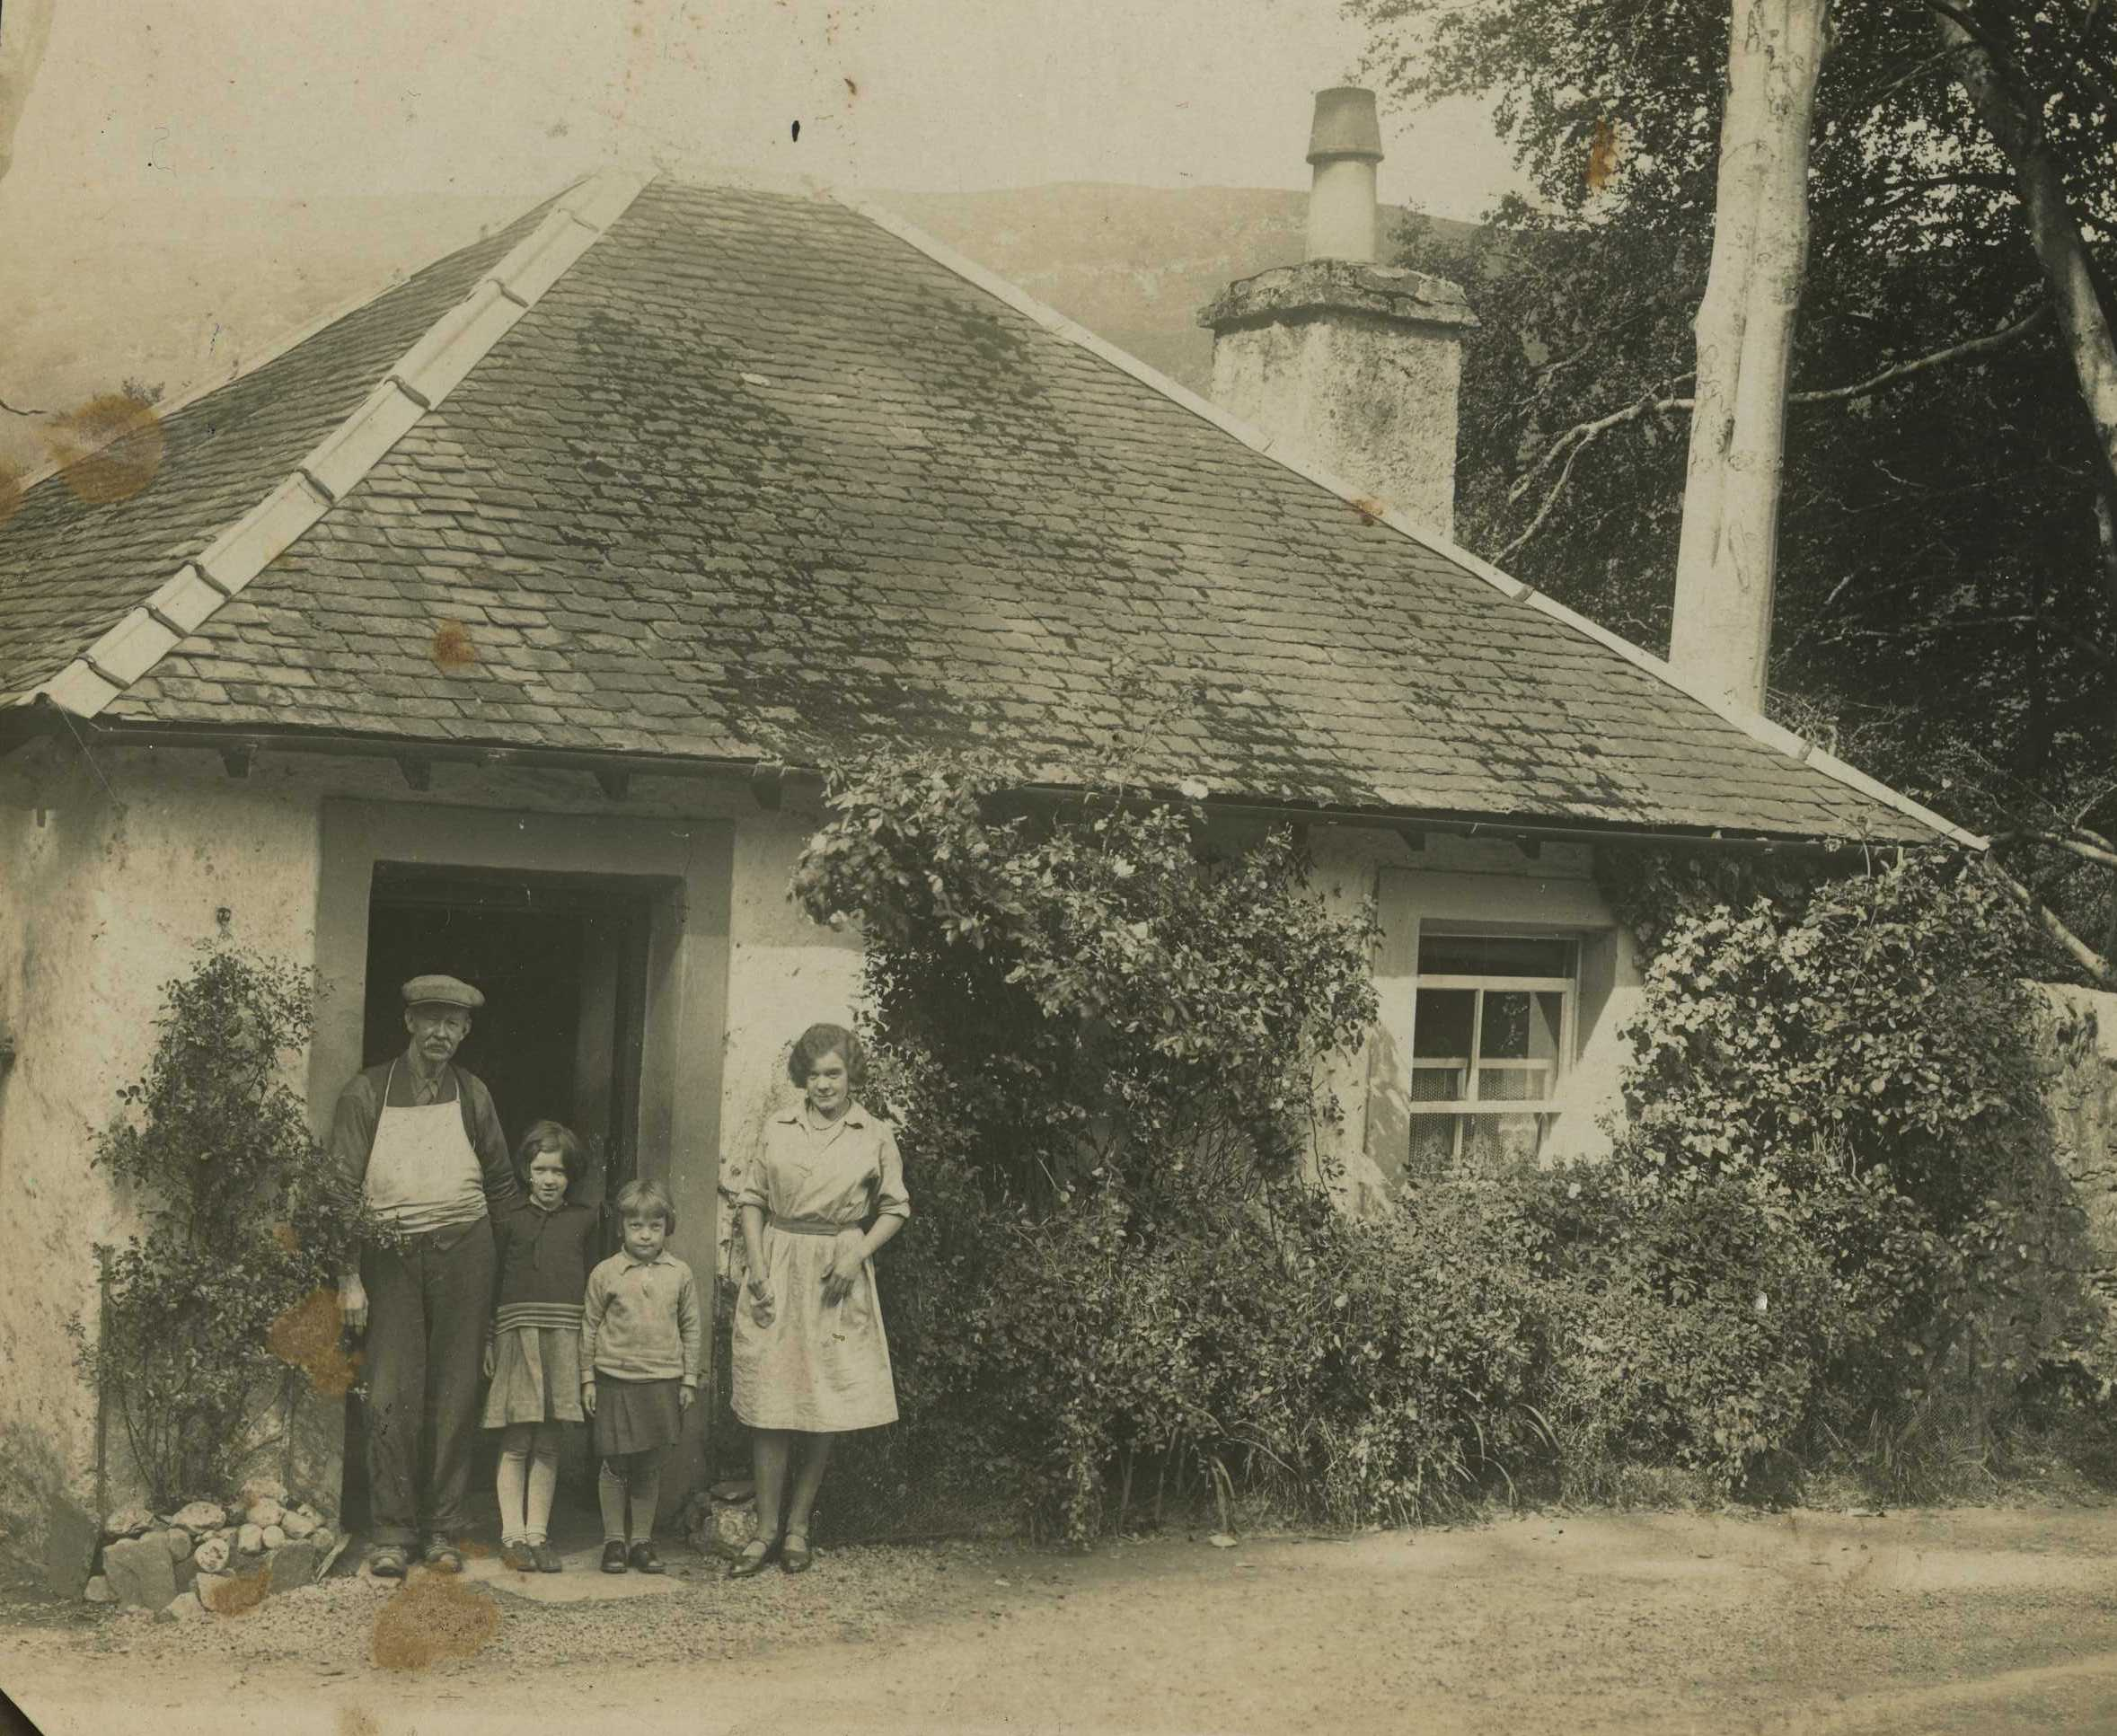 North Lodge at gates to Ardkinglas Estate